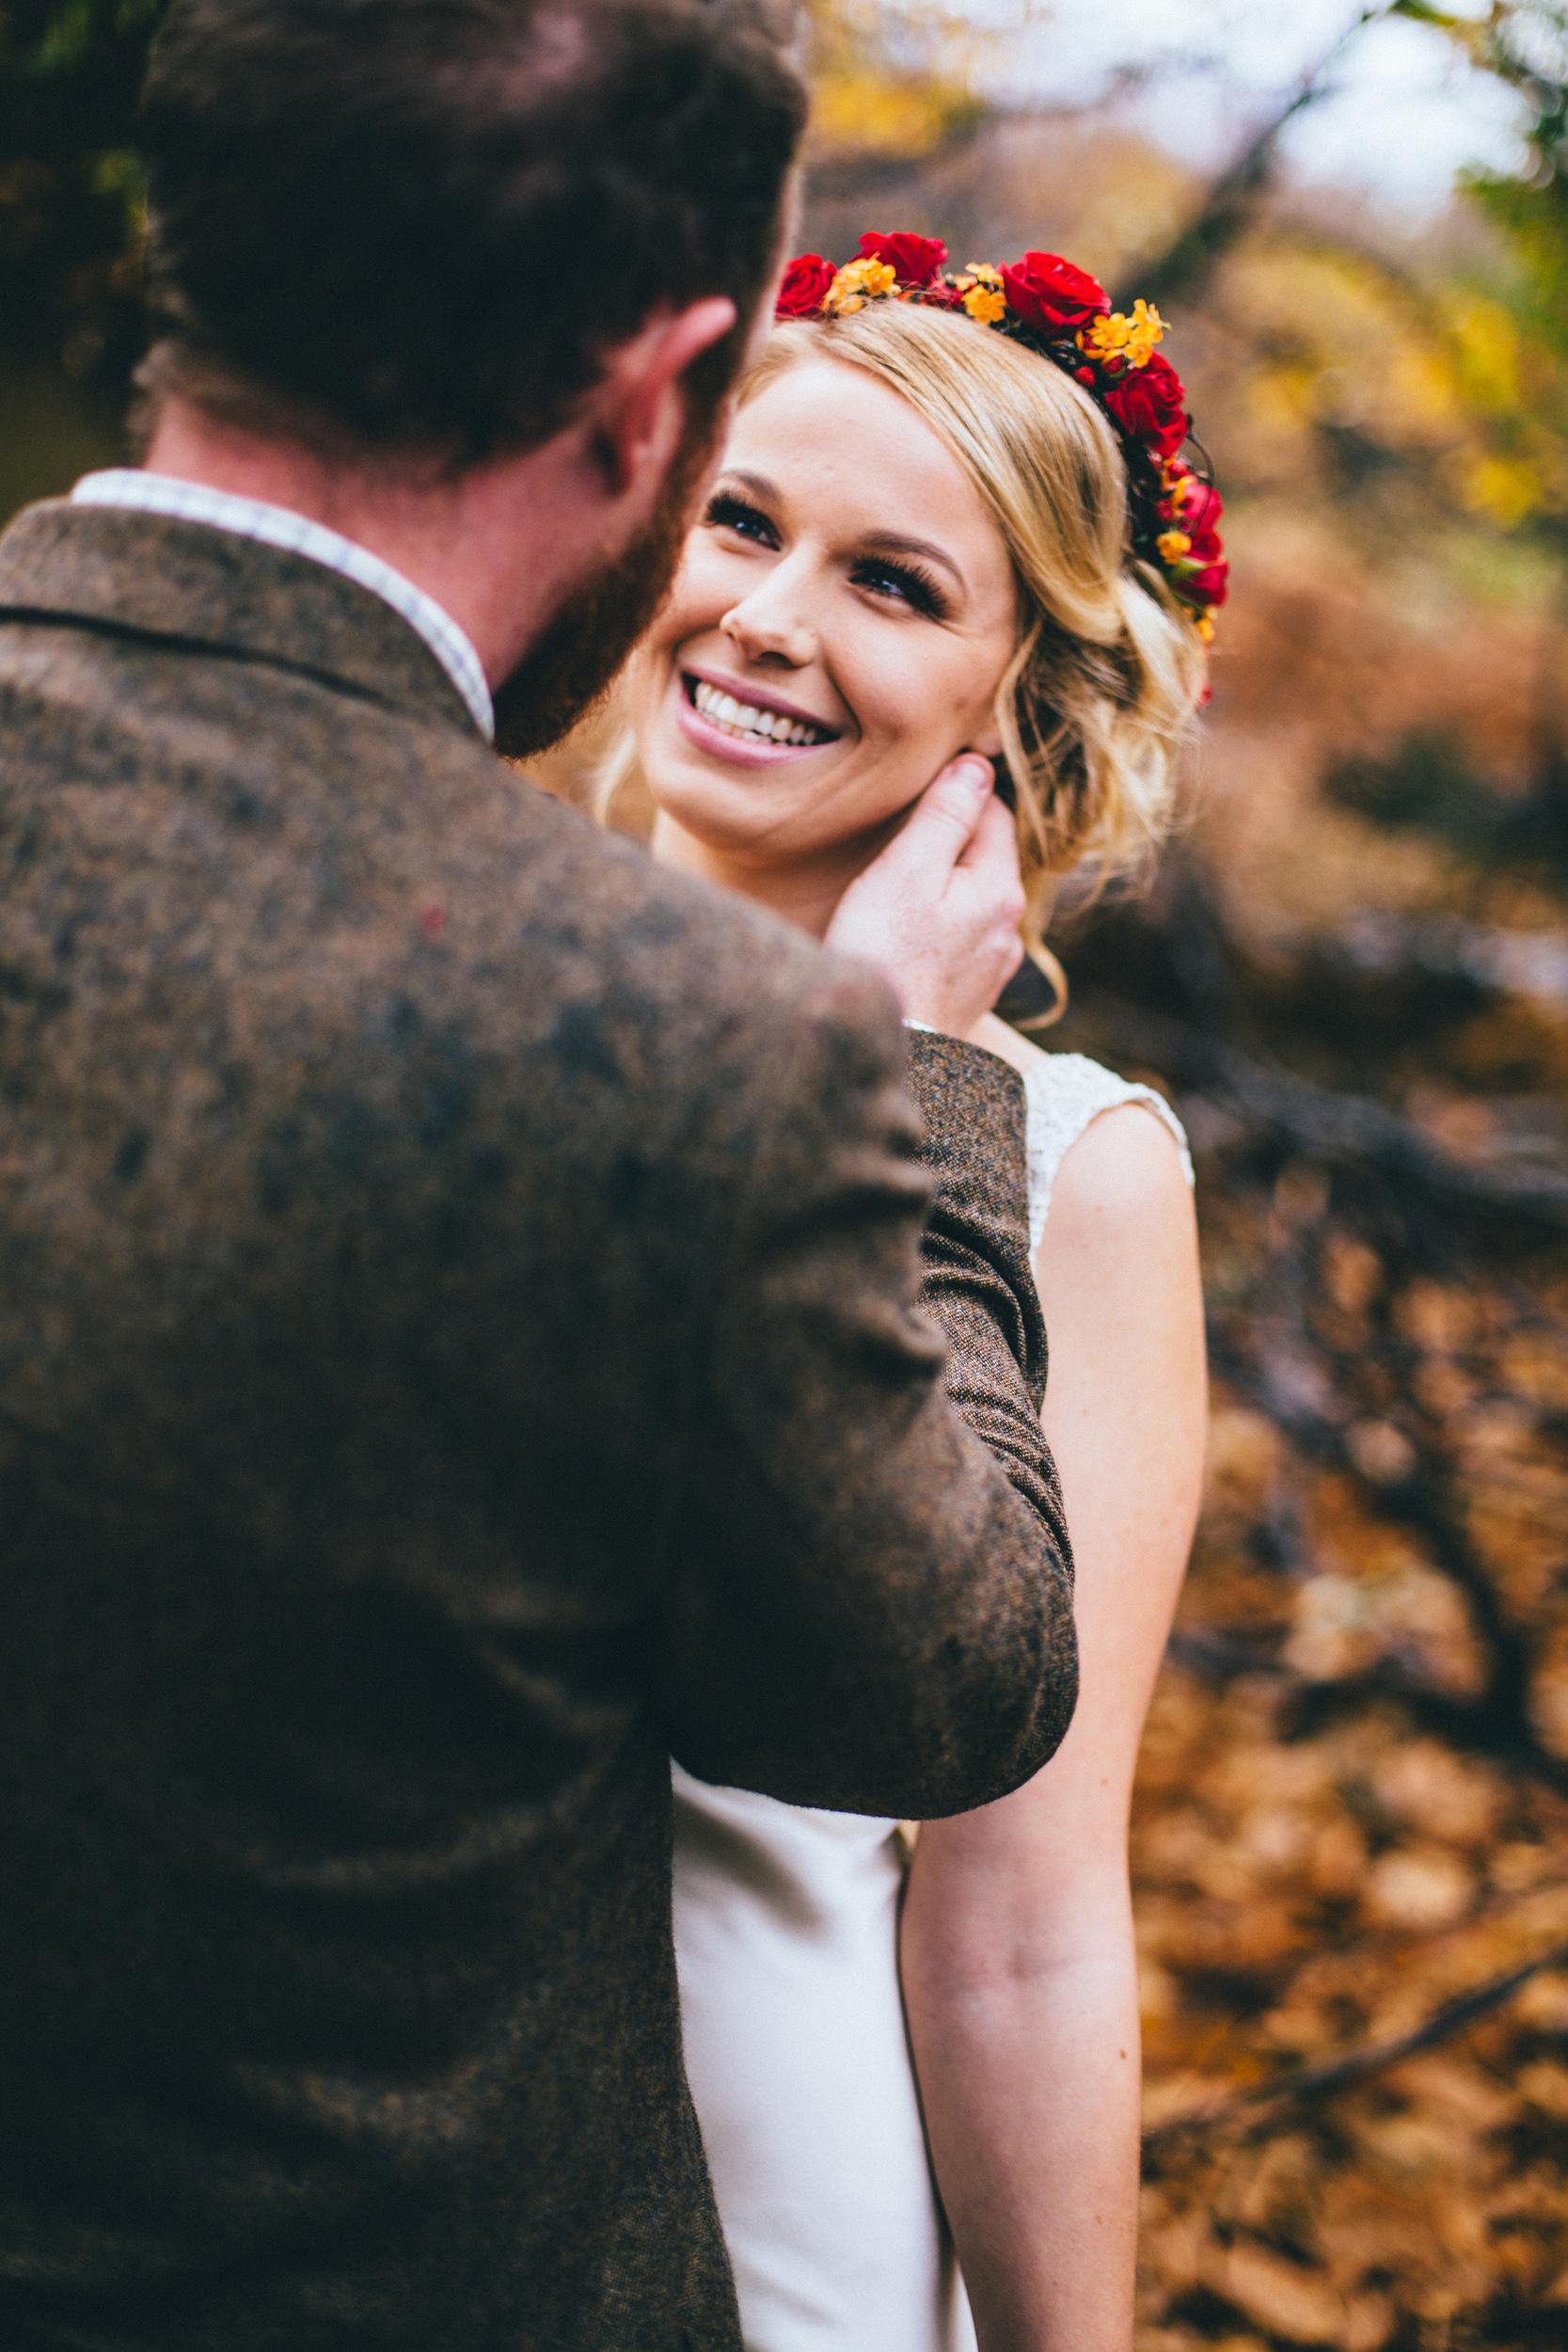 Kate-Beaumont-Wedding-Dresses-Autumn-Shoot-Rebecca-Tovey-4.jpg